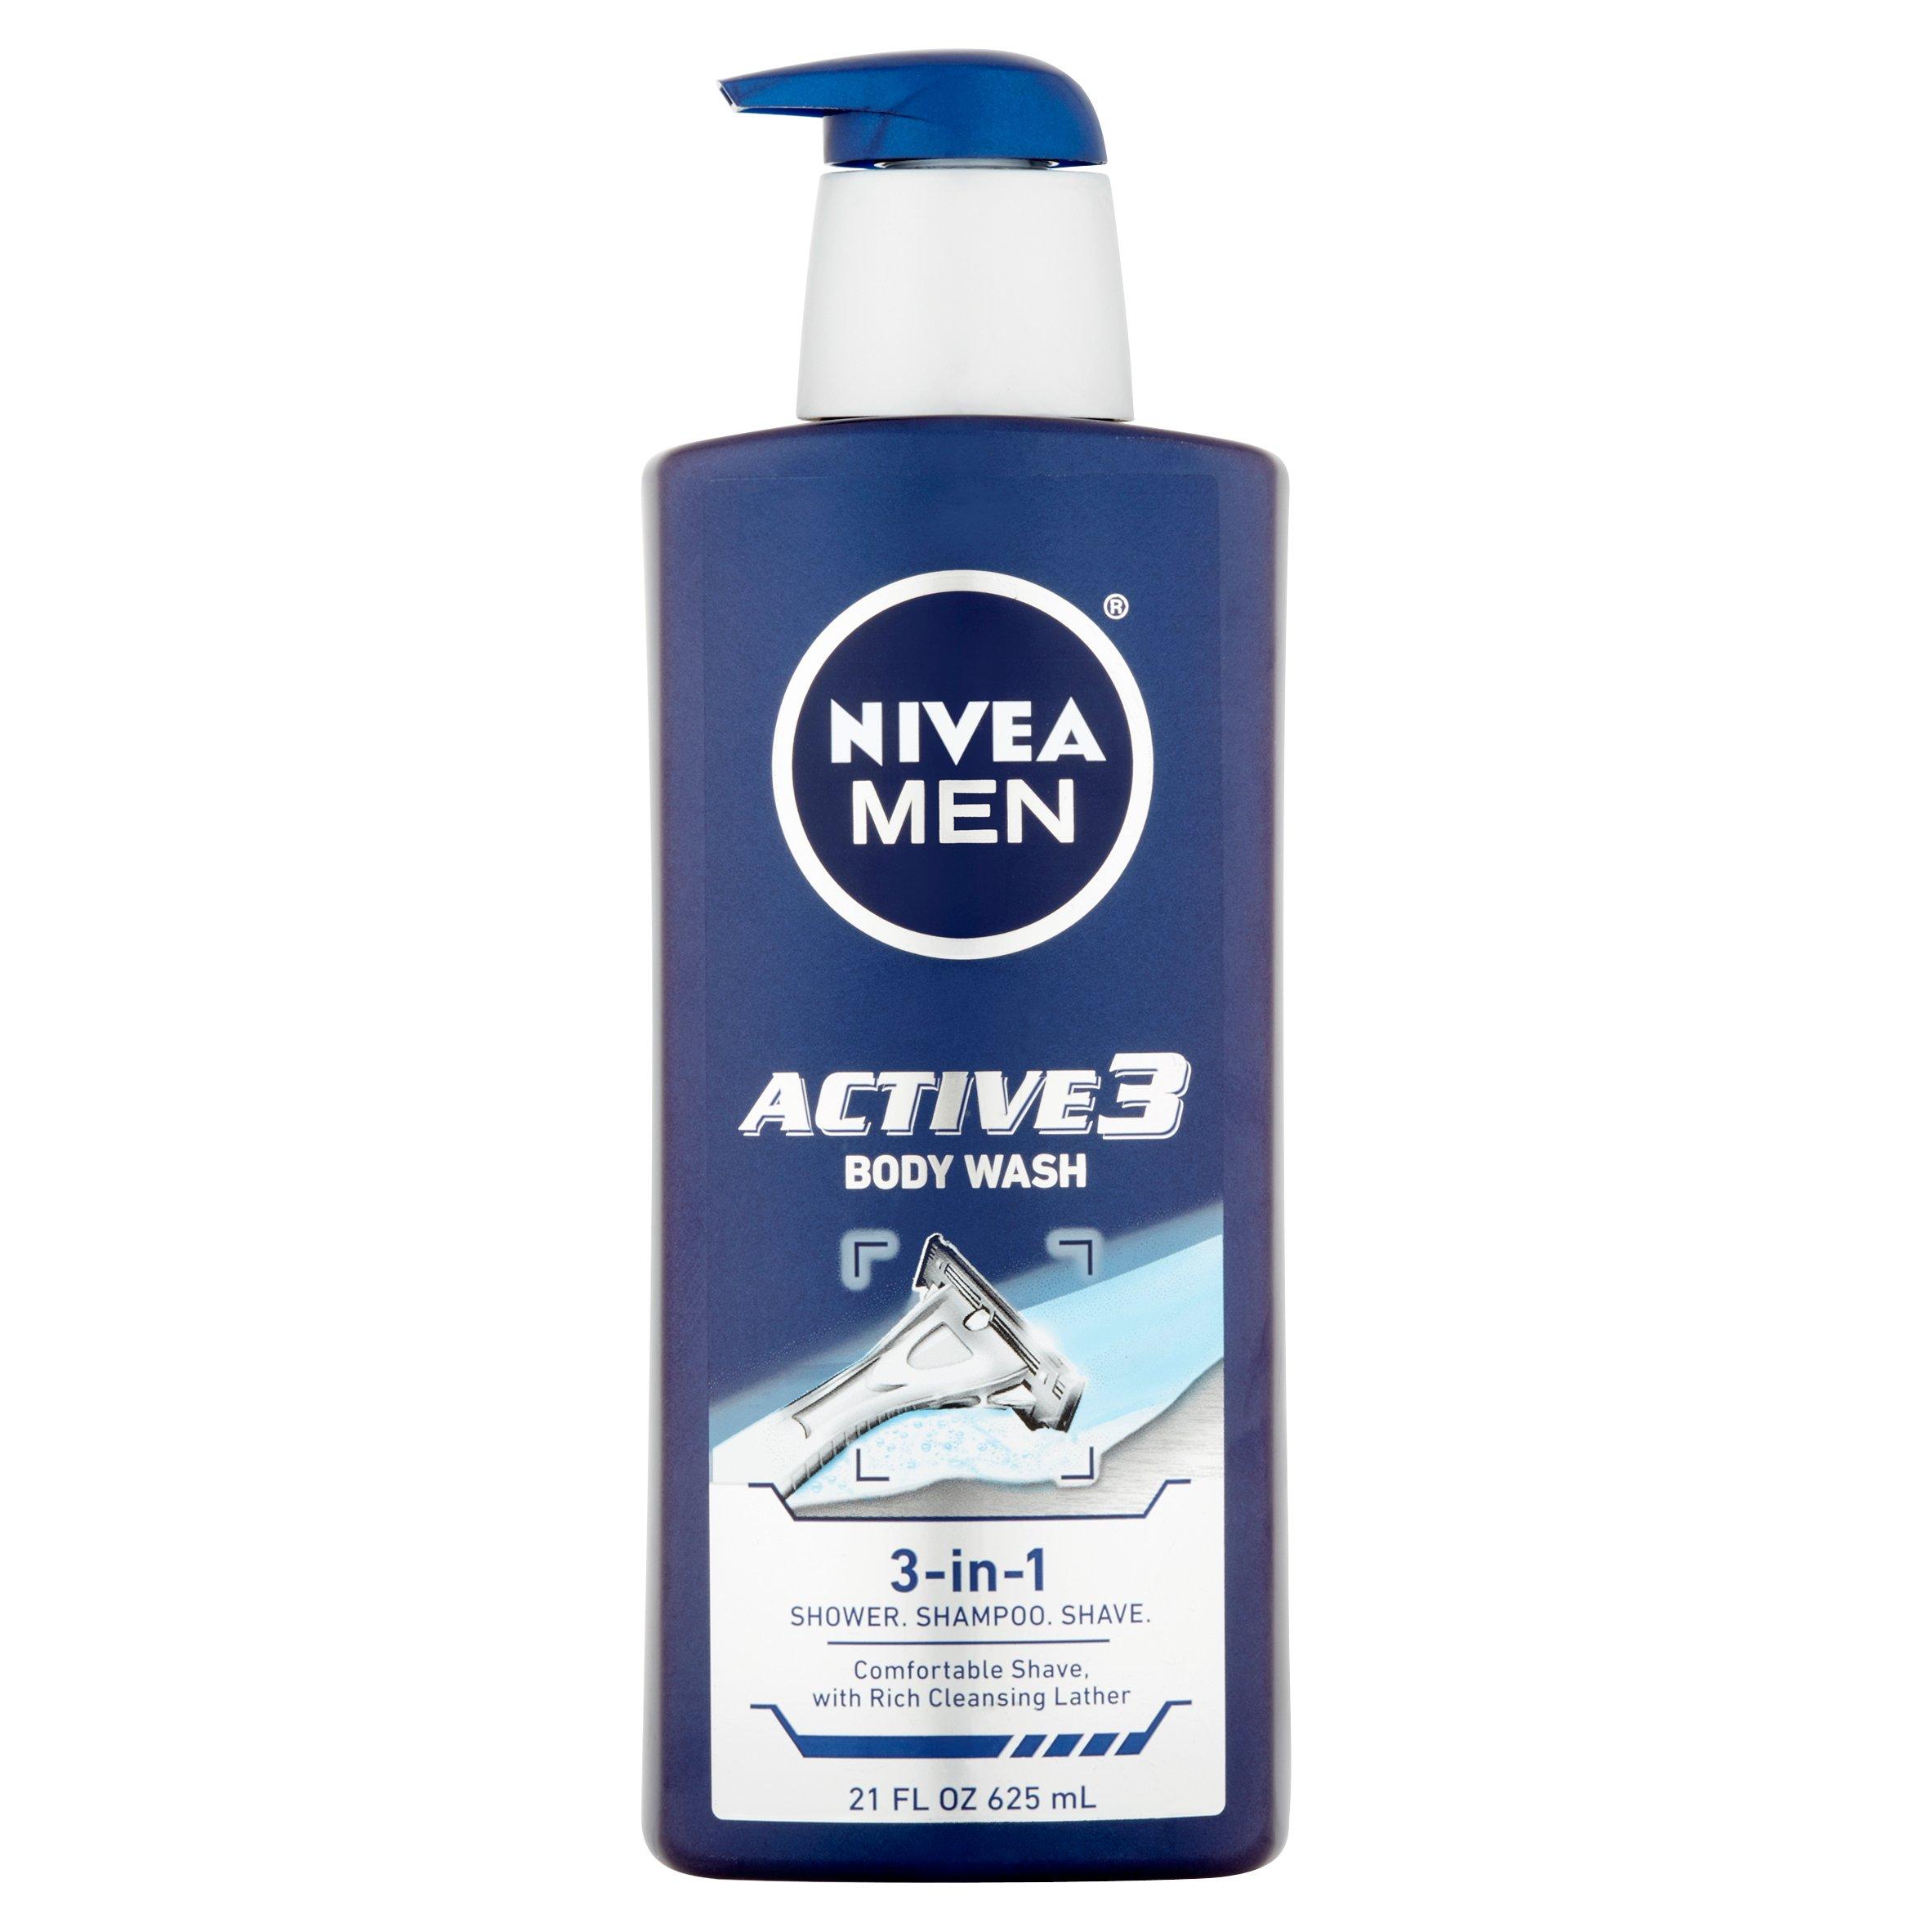 Nivea Men Active 3 Body Wash 3-in-1 Shower, Shampoo, Shave, 21 fl oz - Walmart.com